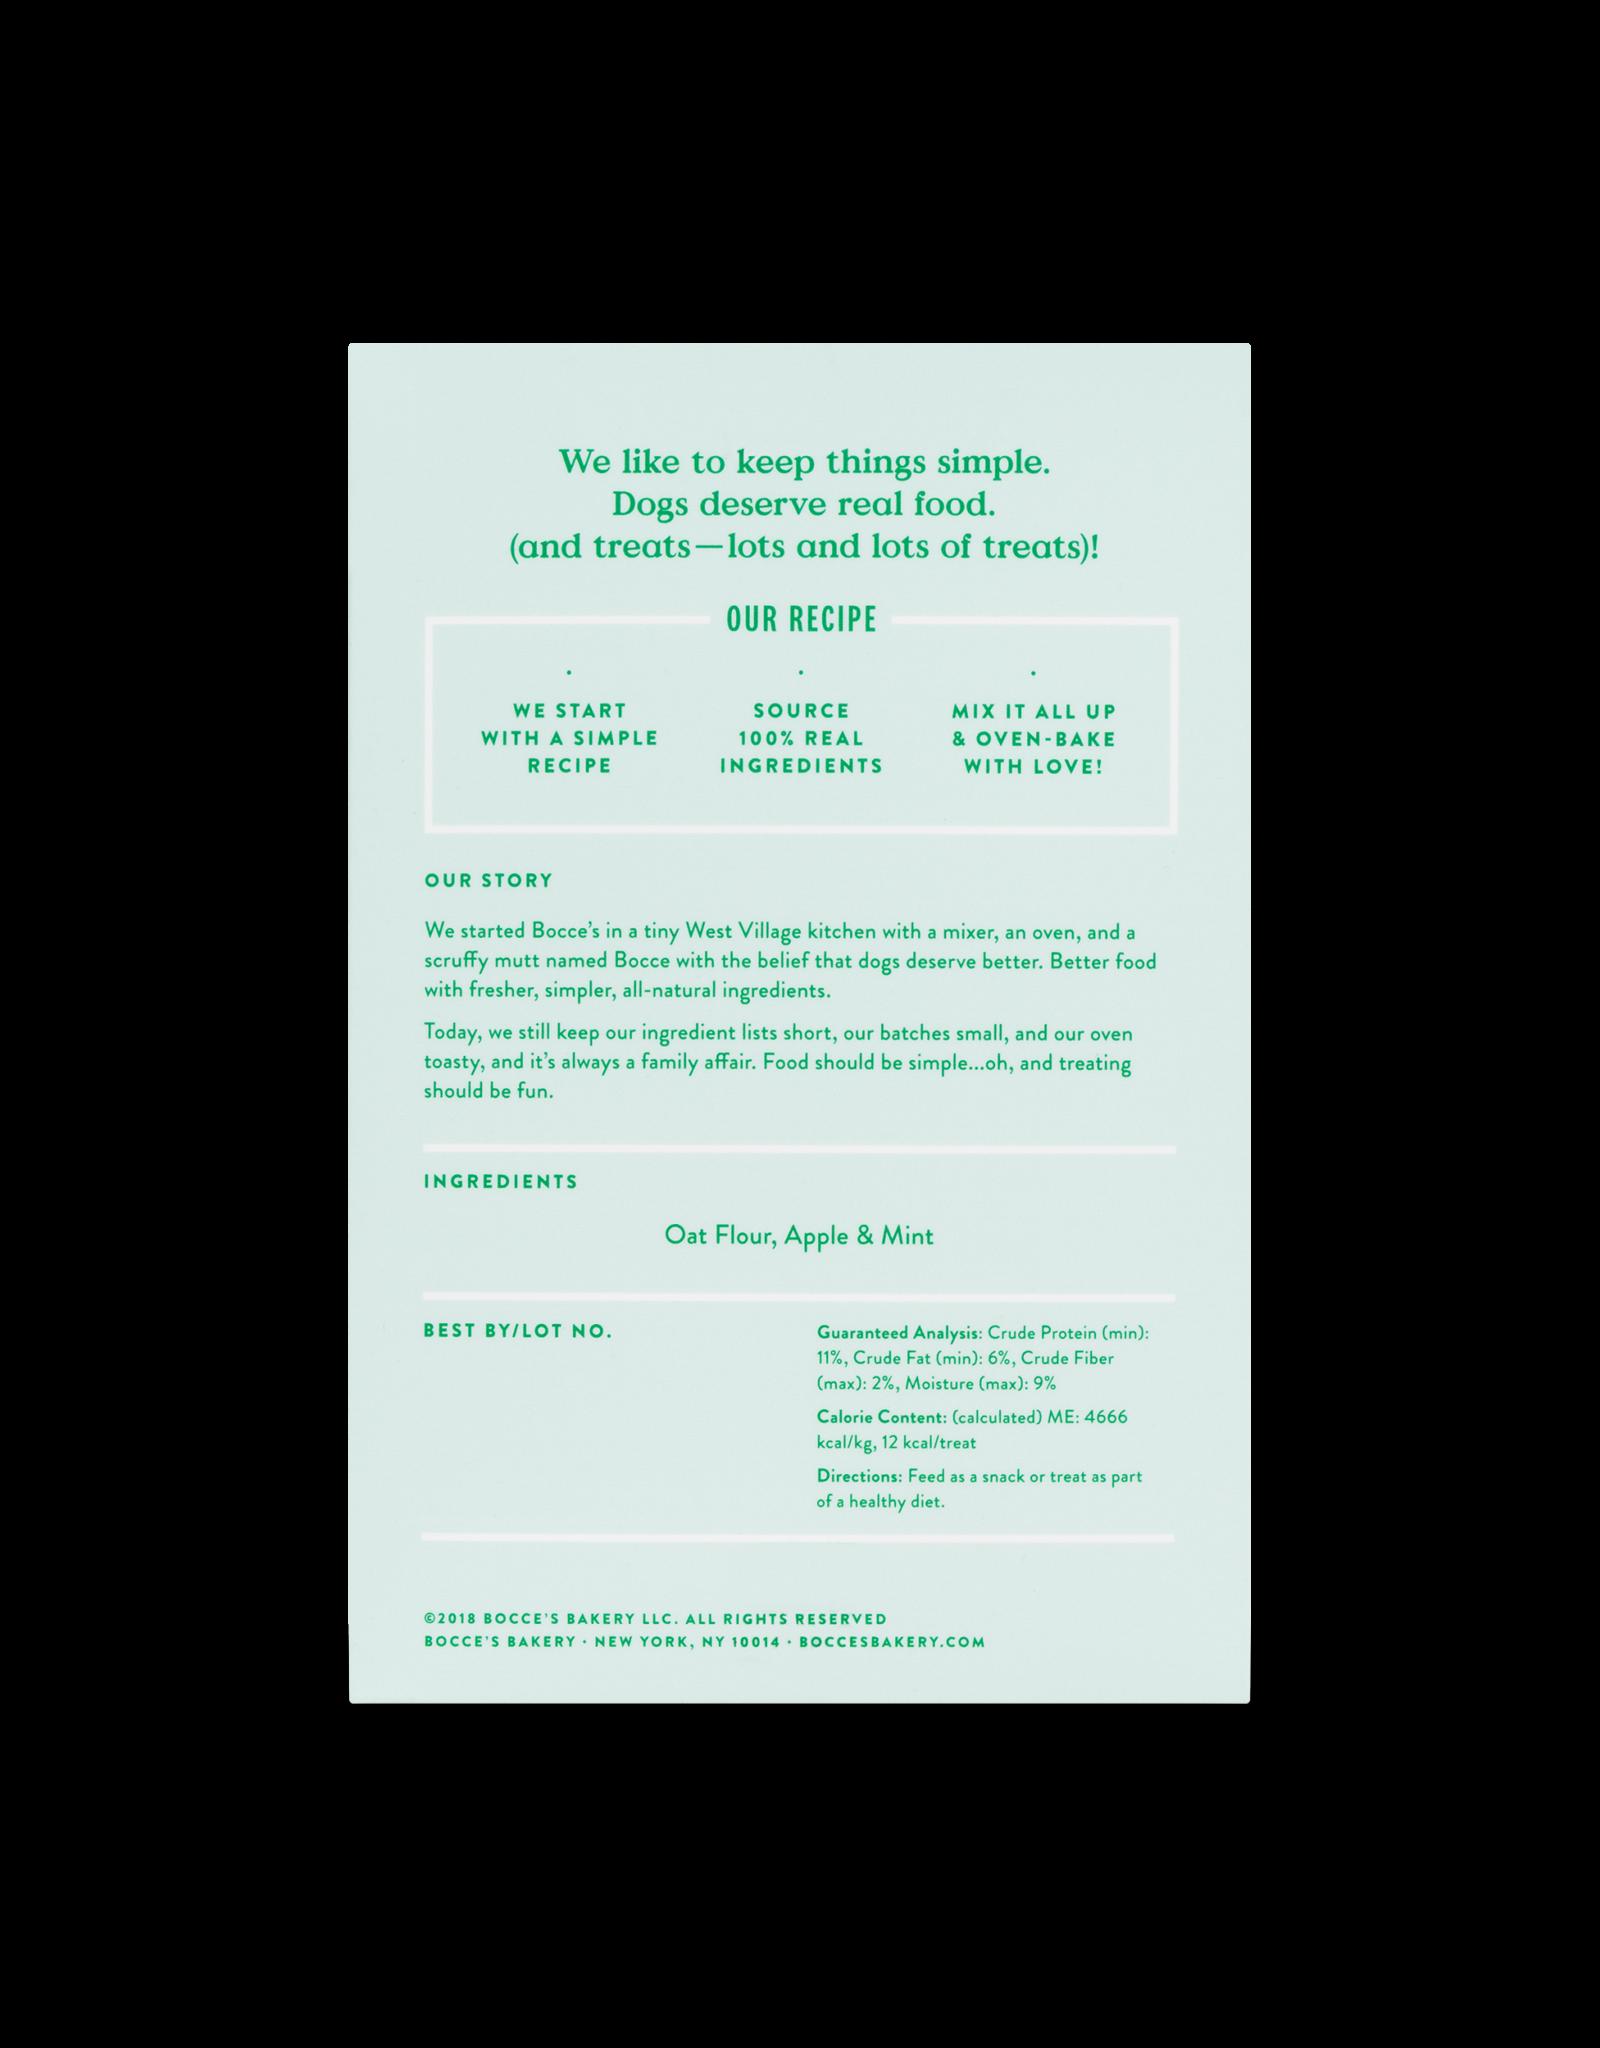 Bocce's Bakery Bocce's Bakery: Breath Aid, 12 oz